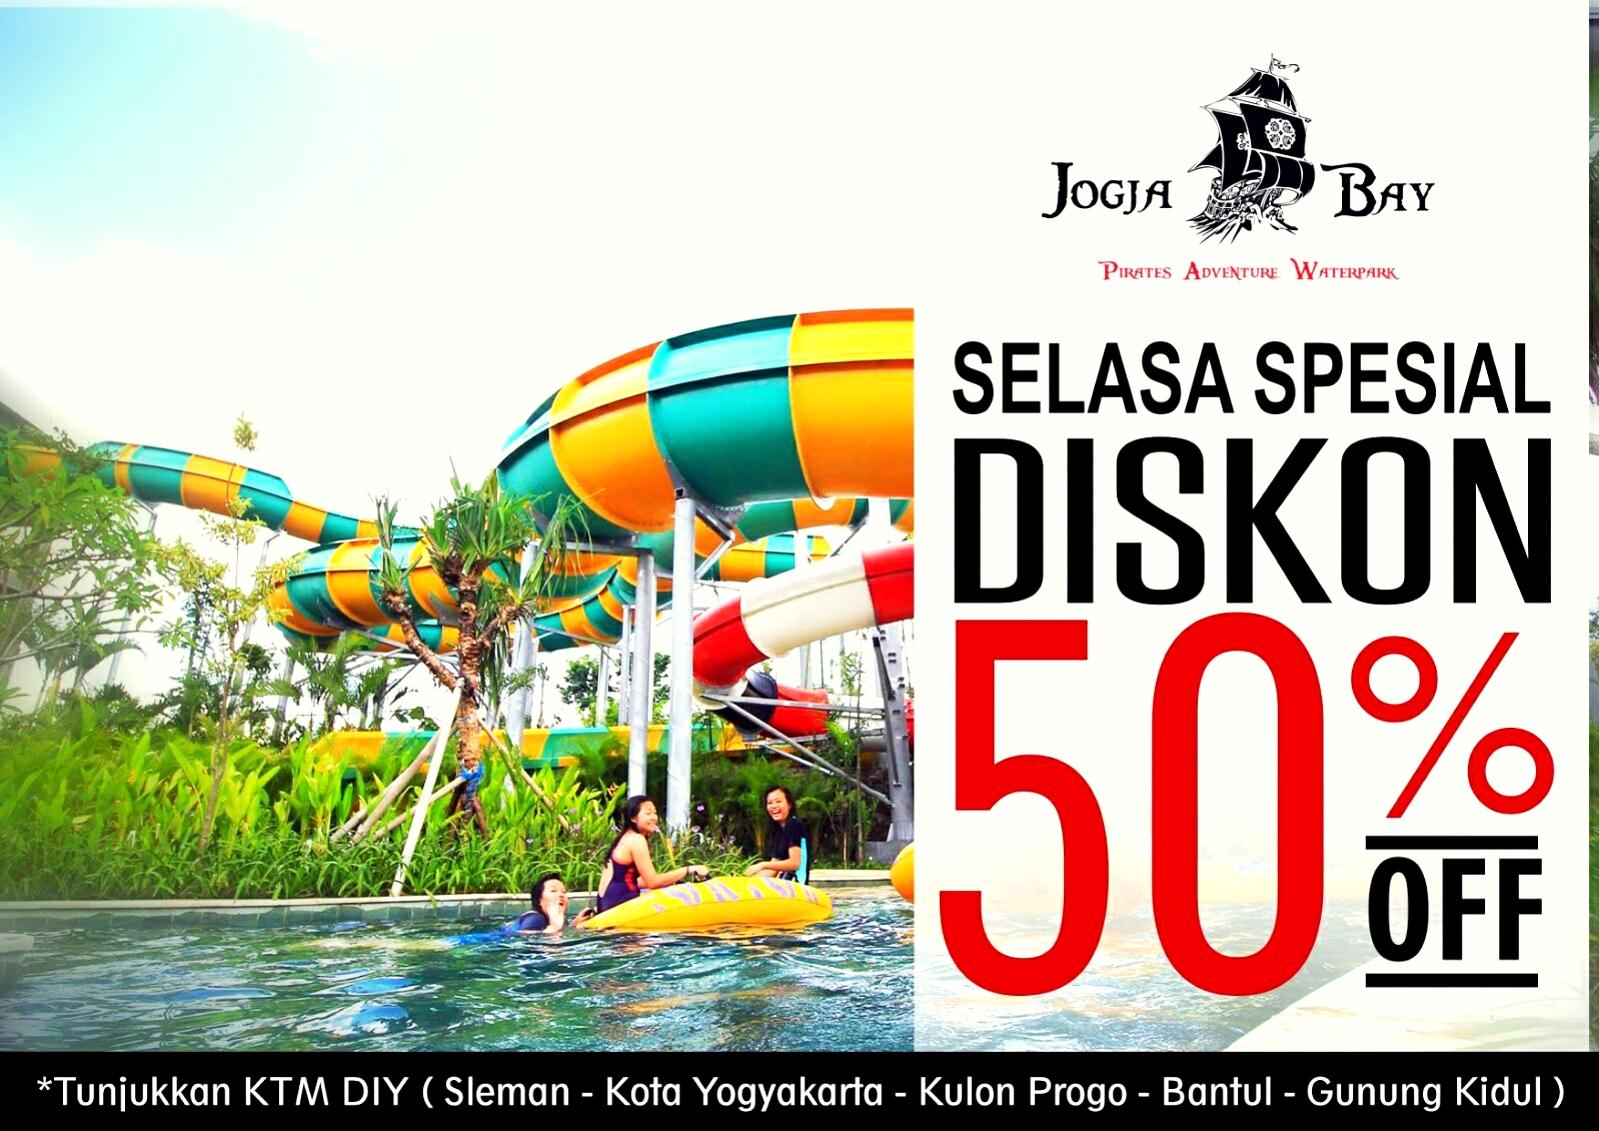 Diskon 50 Warga Yogyakarta Jogja Bay Waterpark Pirates Adventure Kab